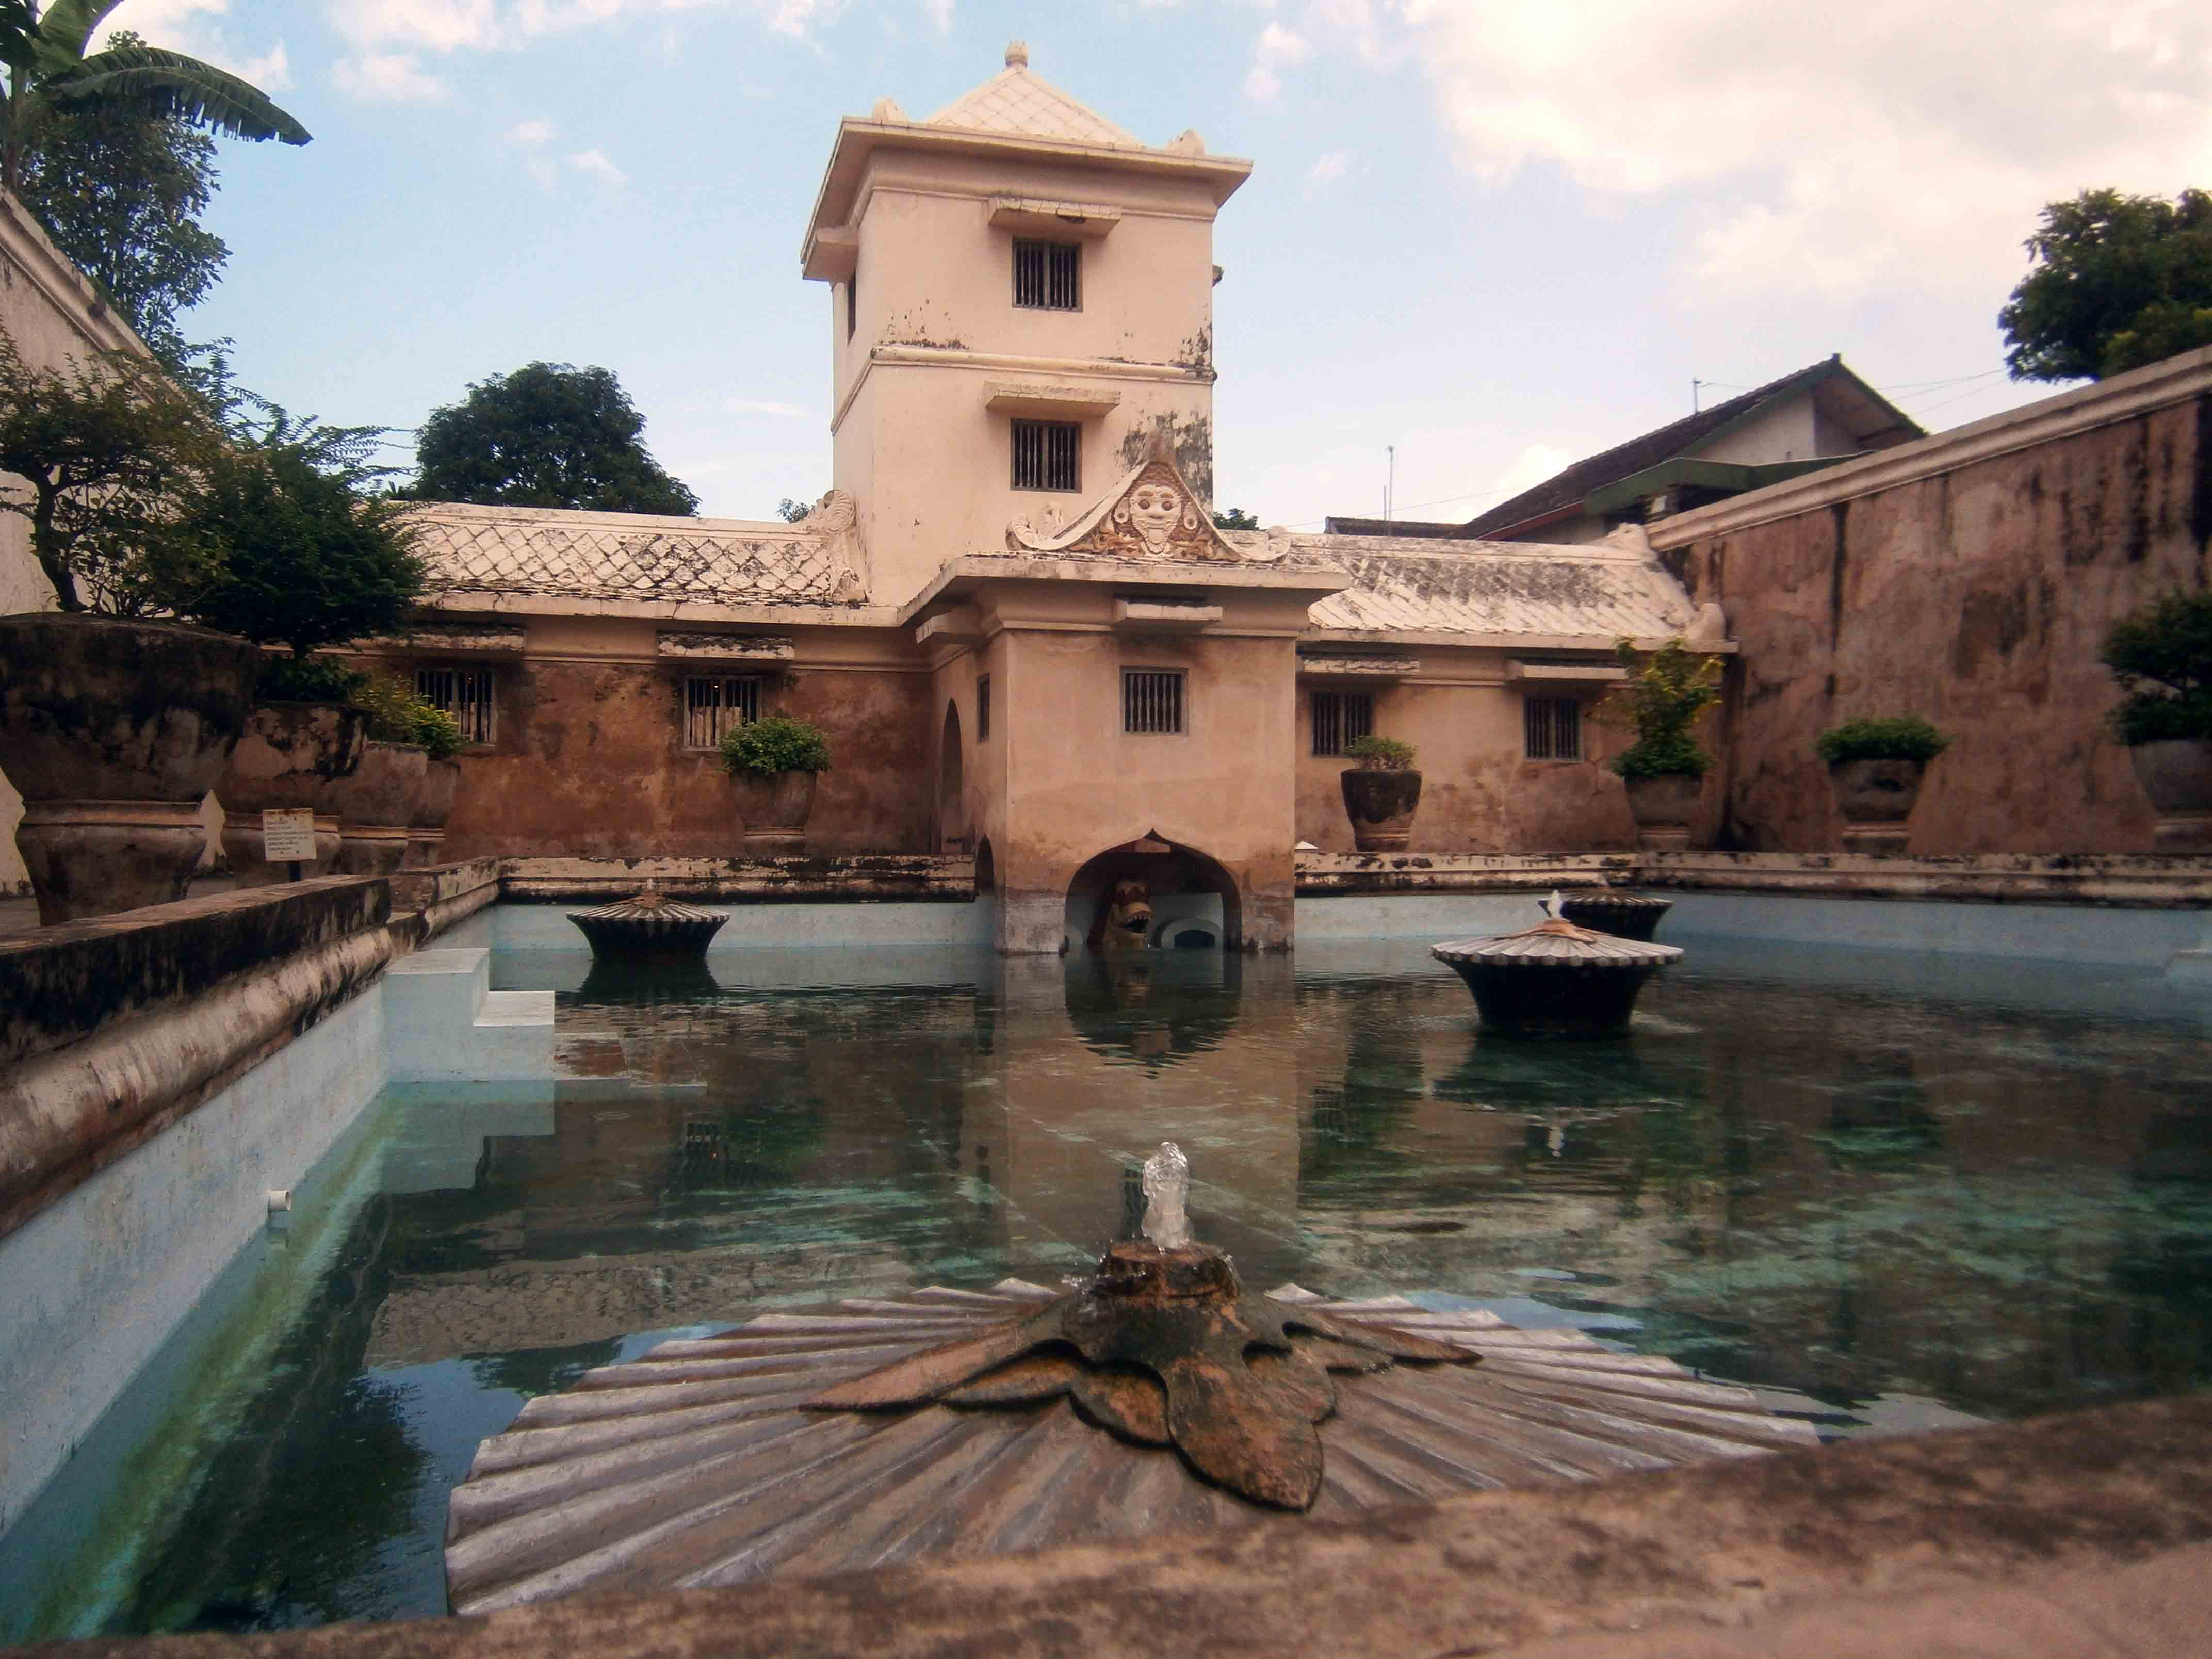 Married Maps Blog Archive Taman Sari Water Castle Yogyakarta Kota